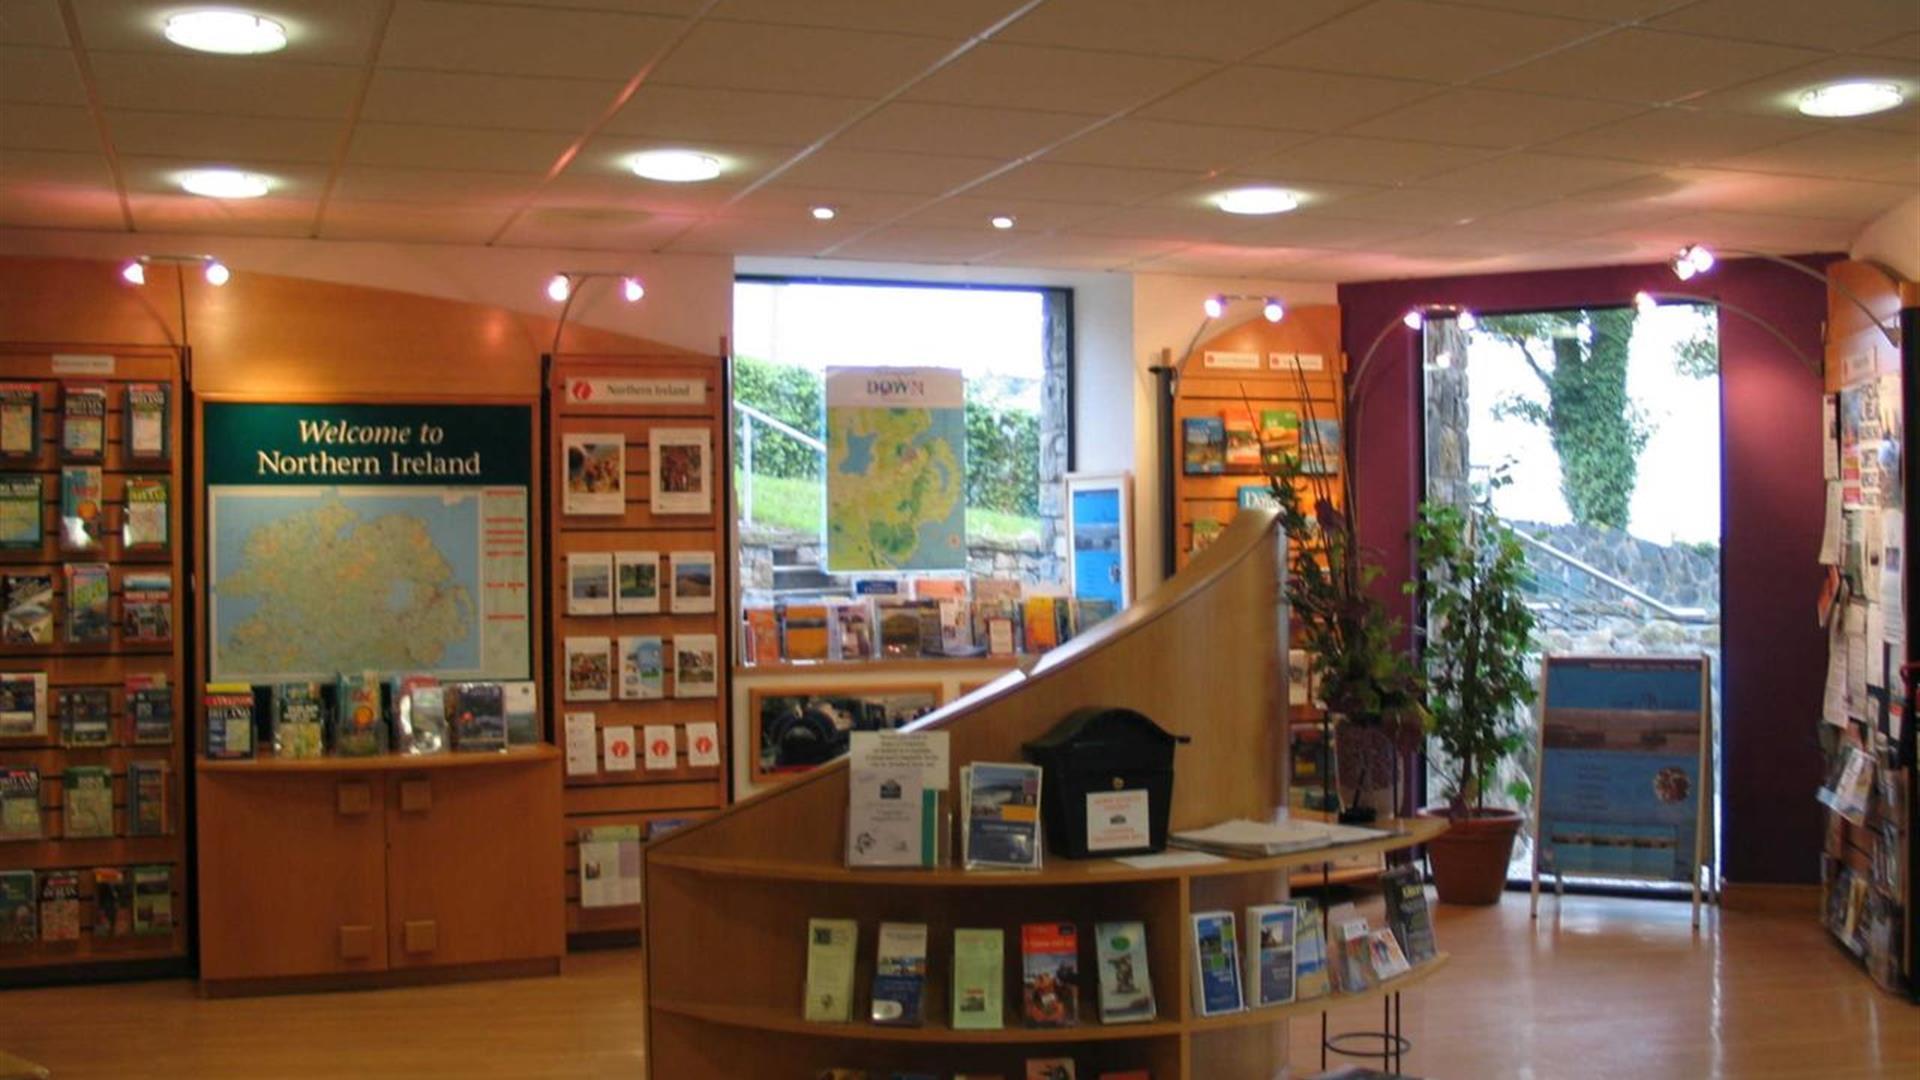 Downpatrick Visitor Information Centre